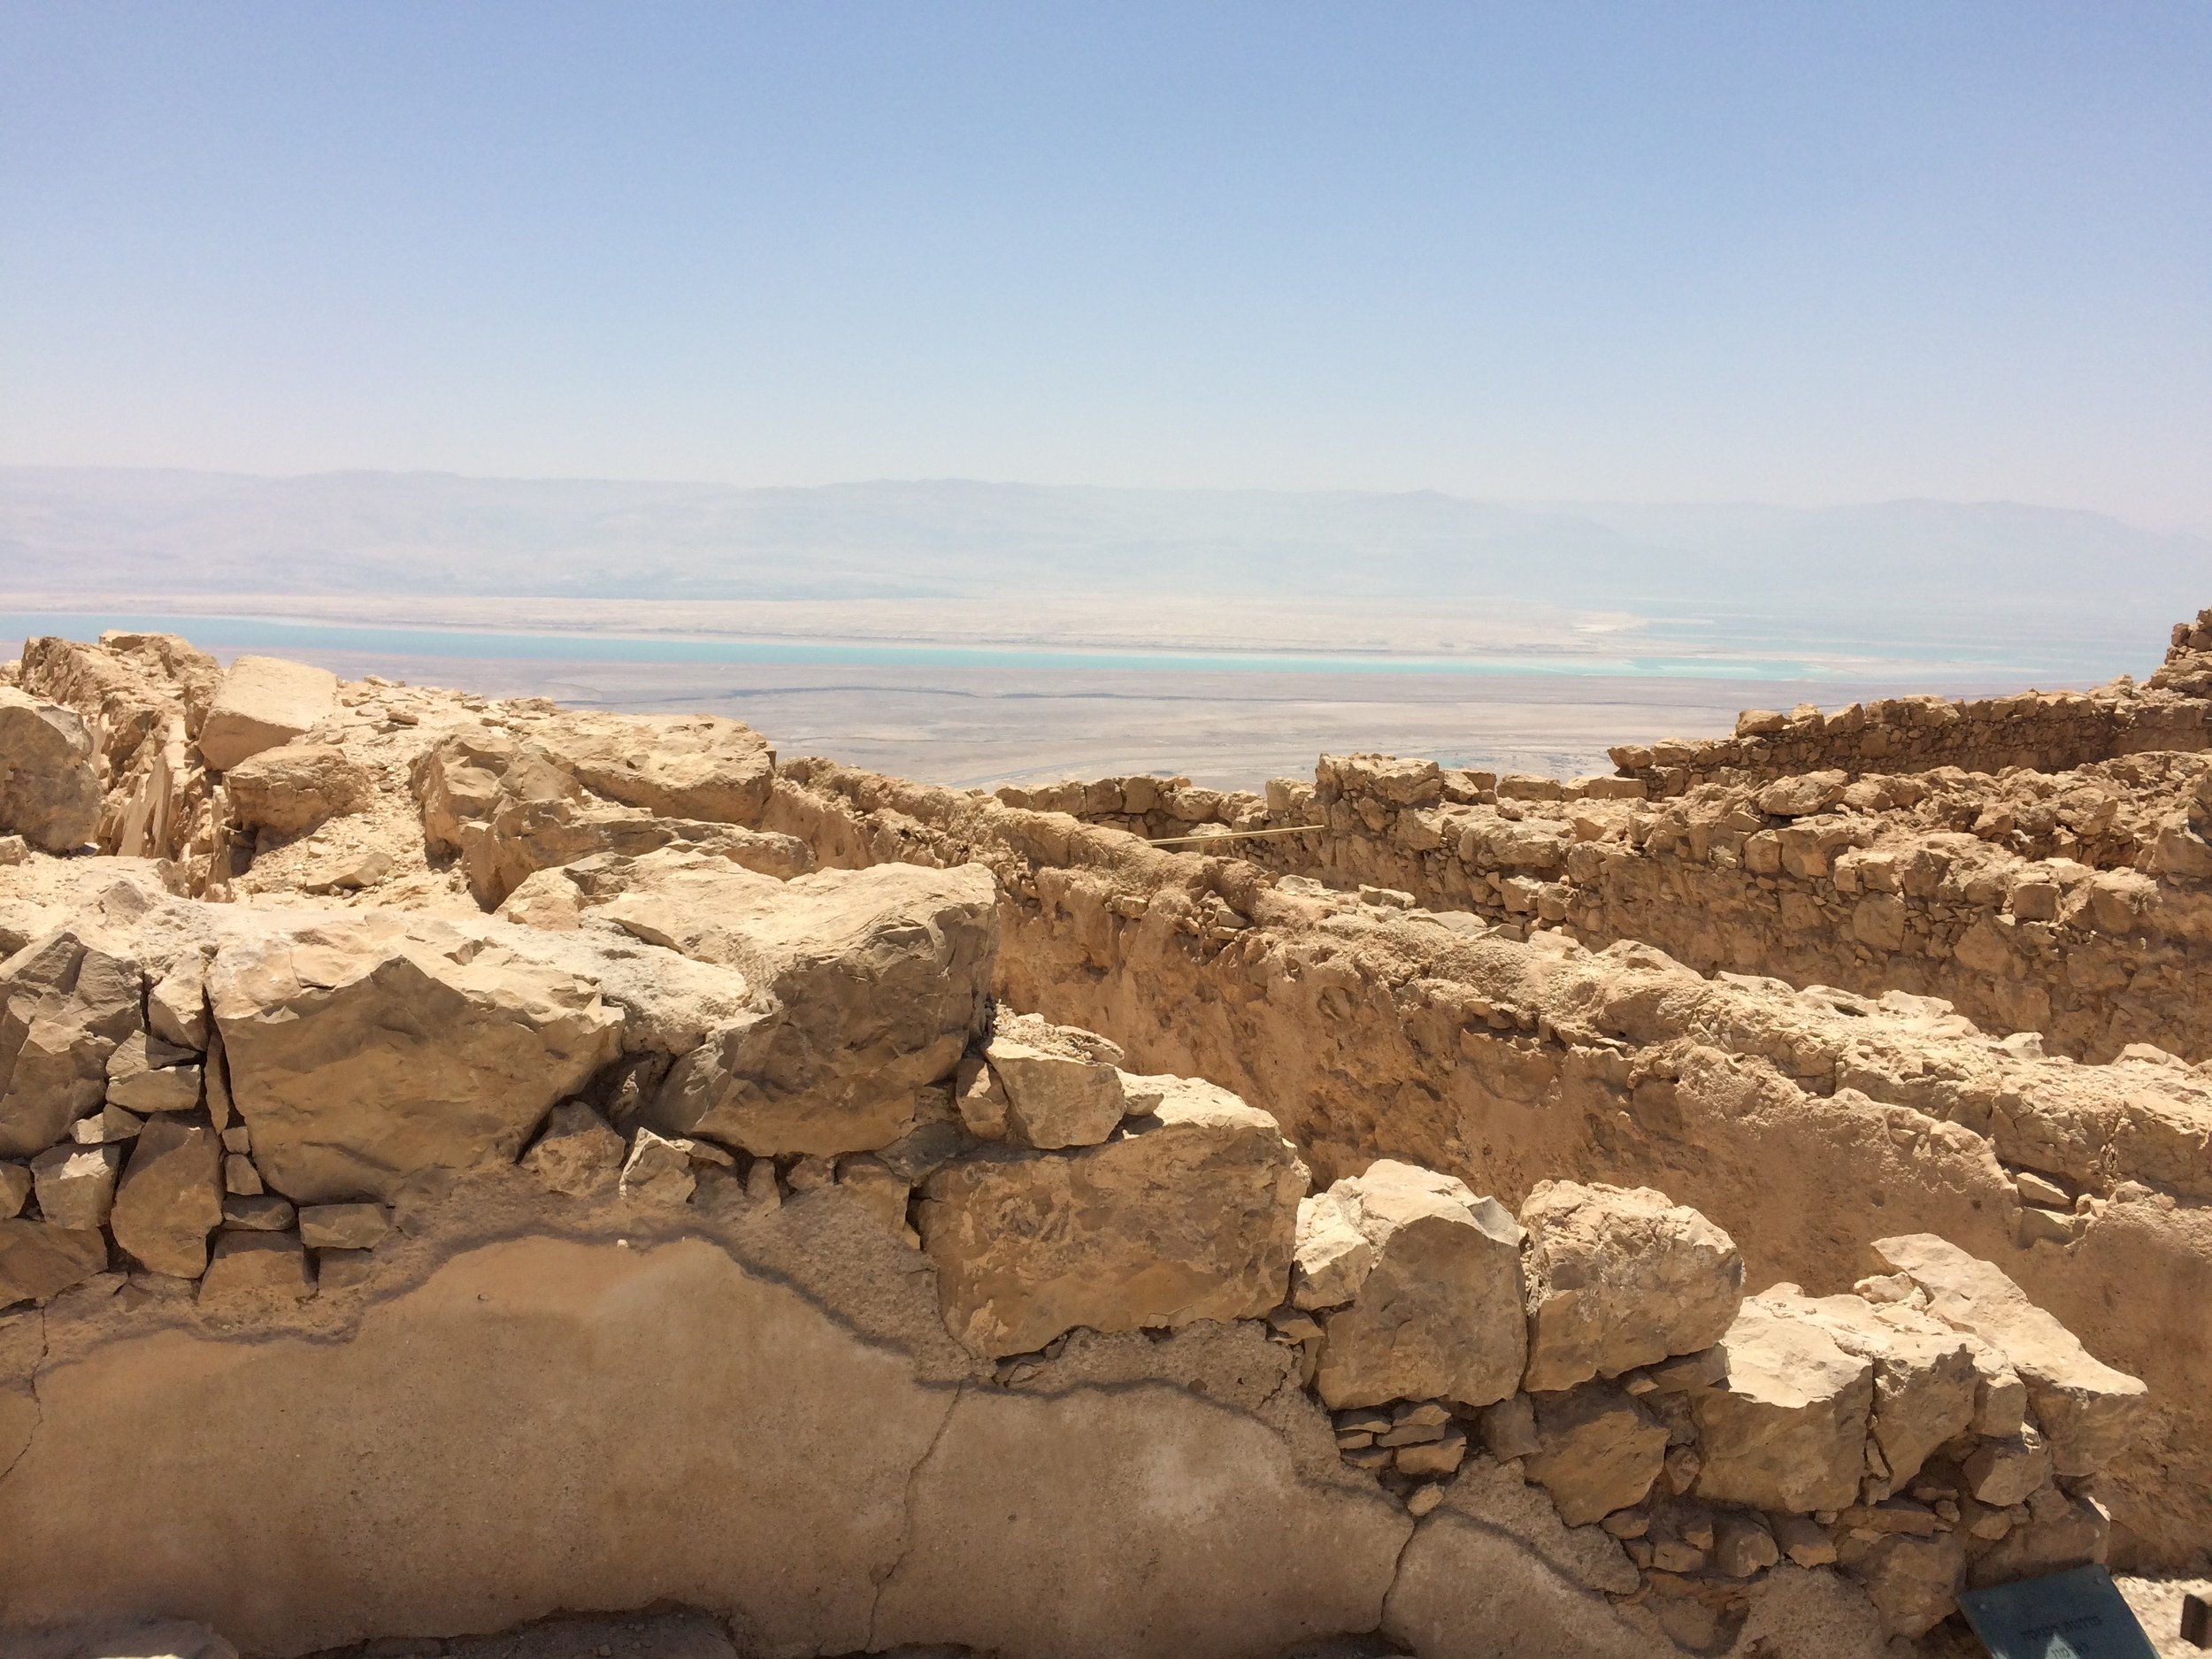 Masada, remnants of Herod's desert fortress